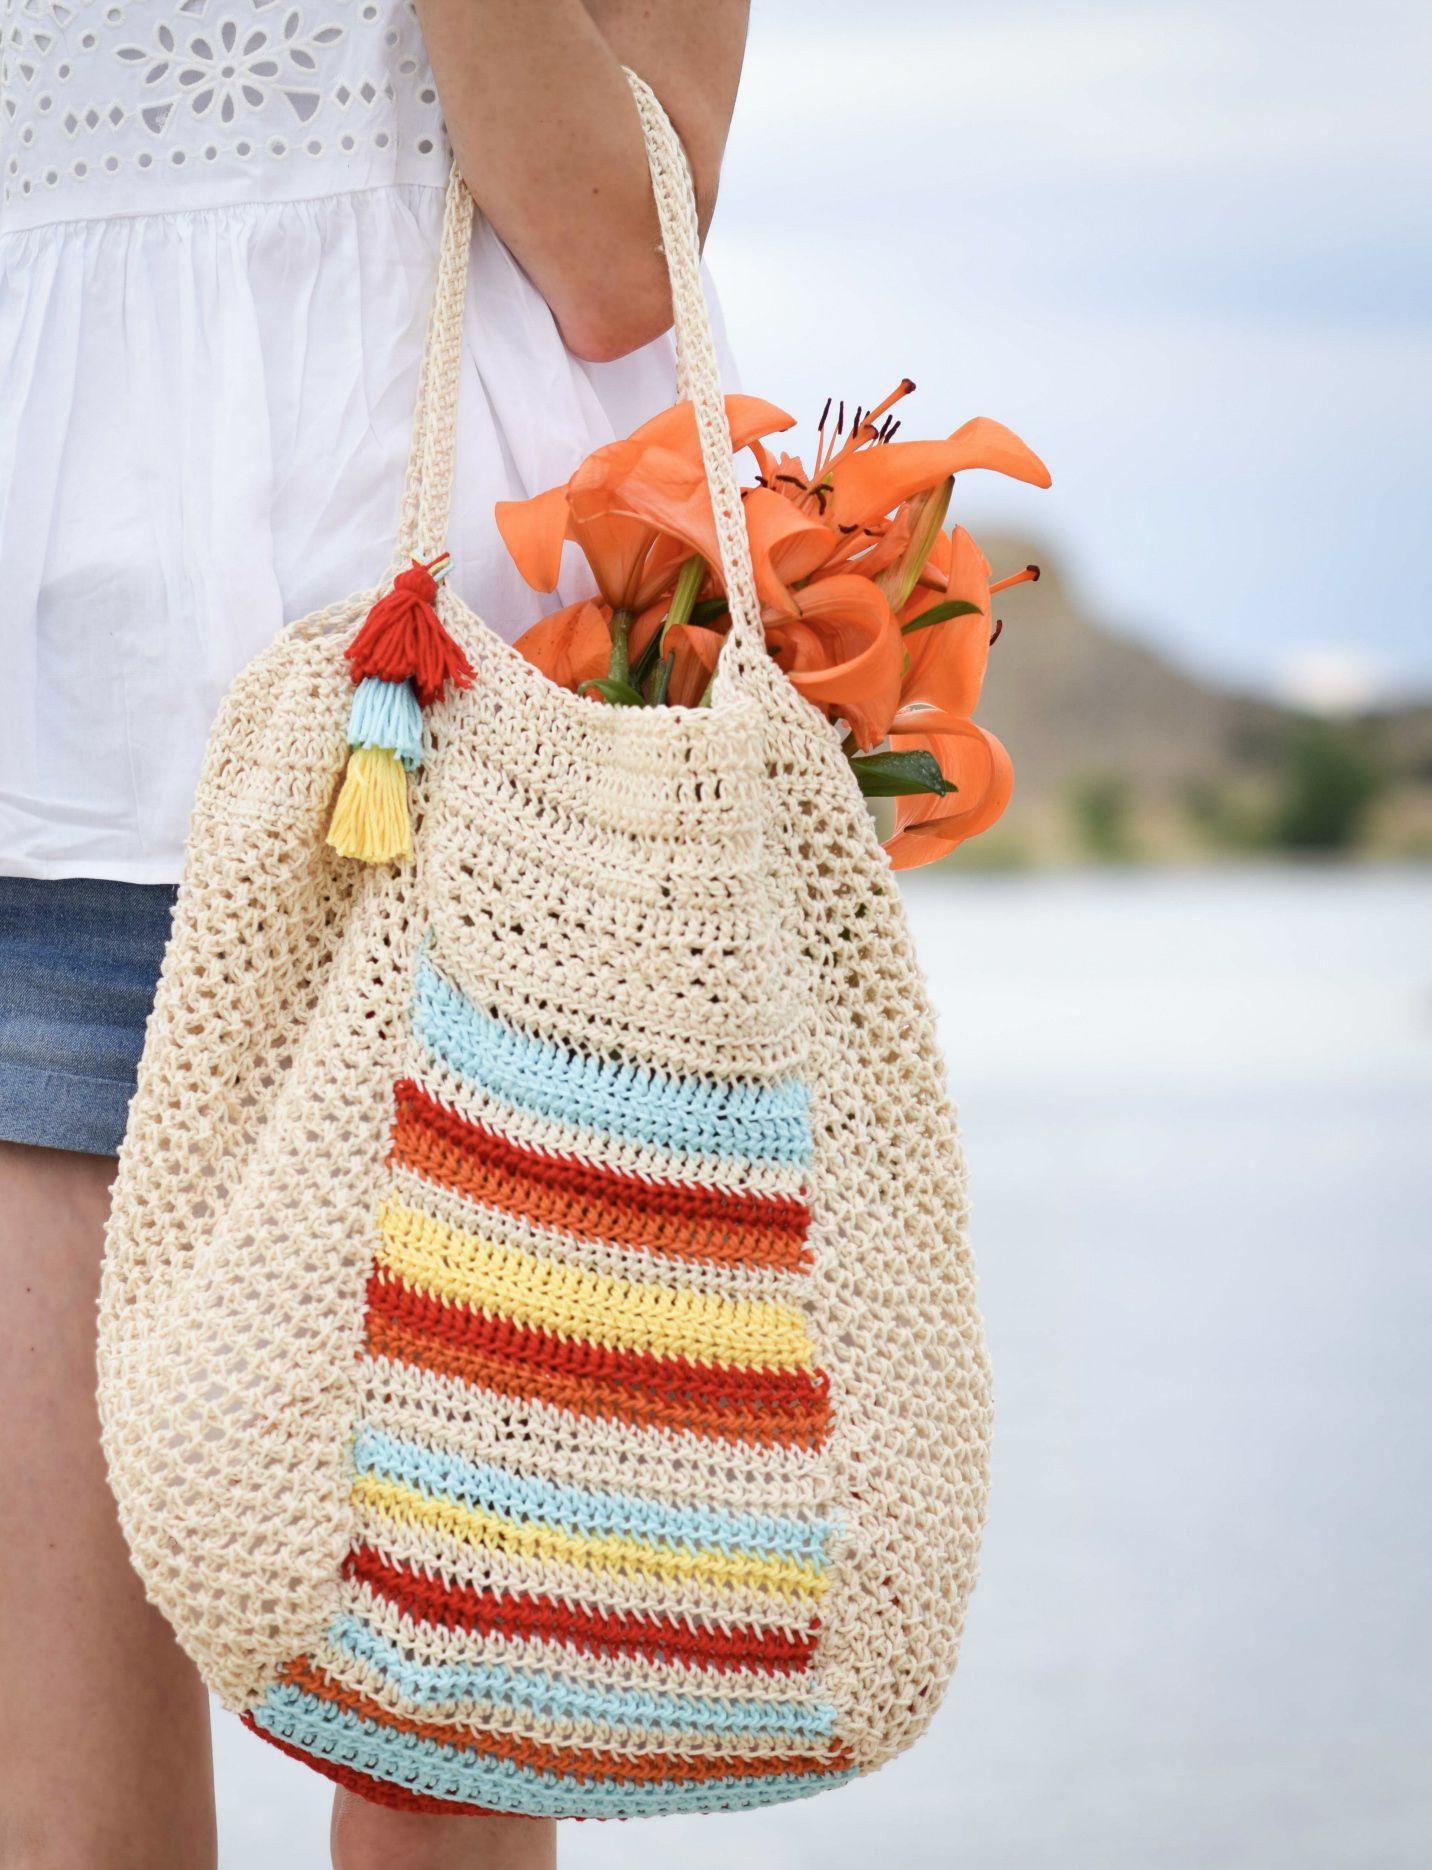 Caribe Big Crocheted Bag Pattern Crochet Pinterest Crochet